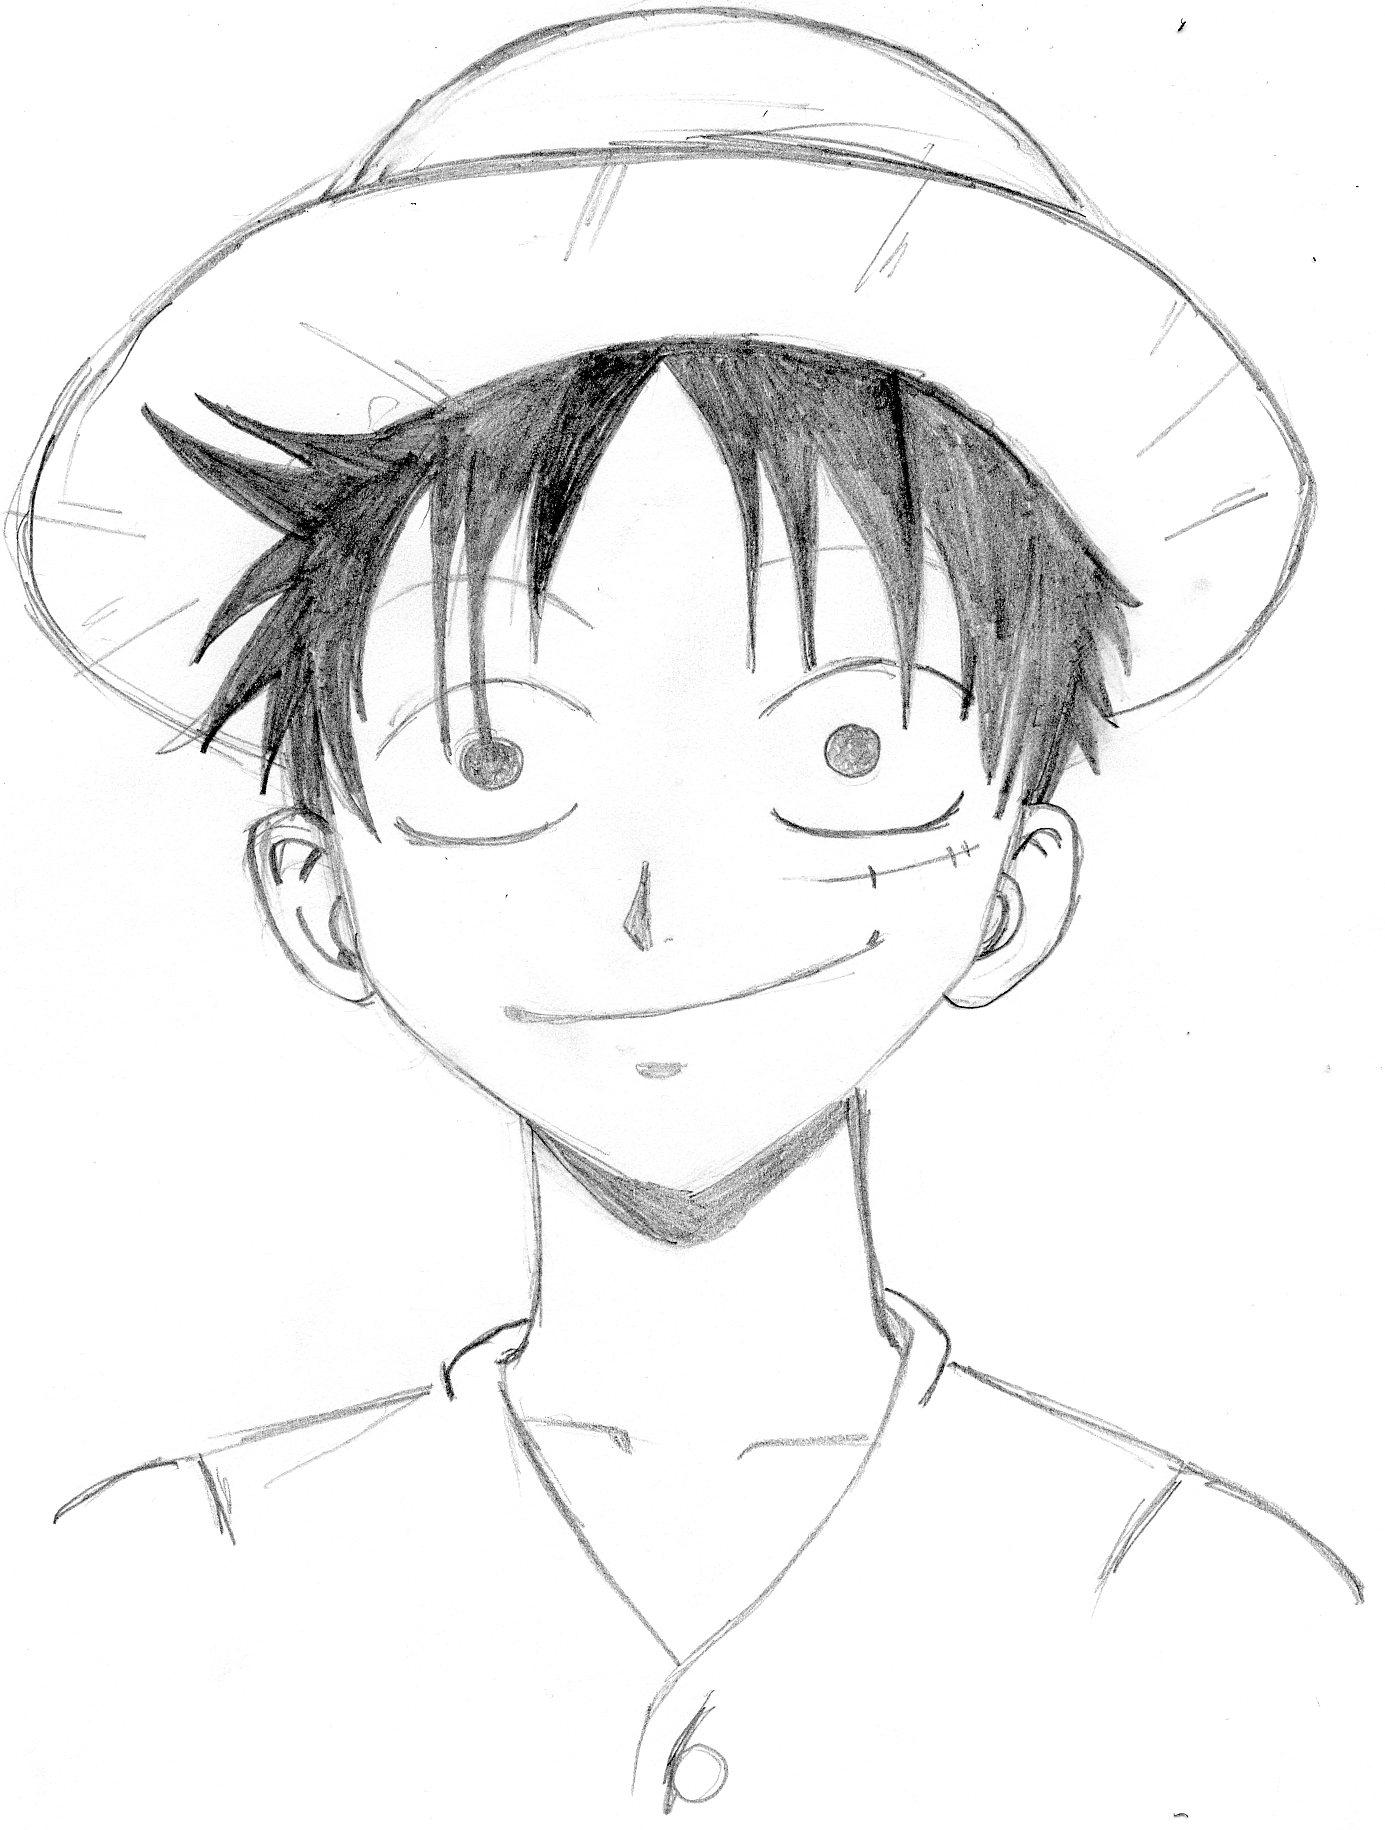 Frais Coloriage One Piece Luffy 2 Ans Plus Tard A Imprimer intérieur Coloriage One Piece Luffy